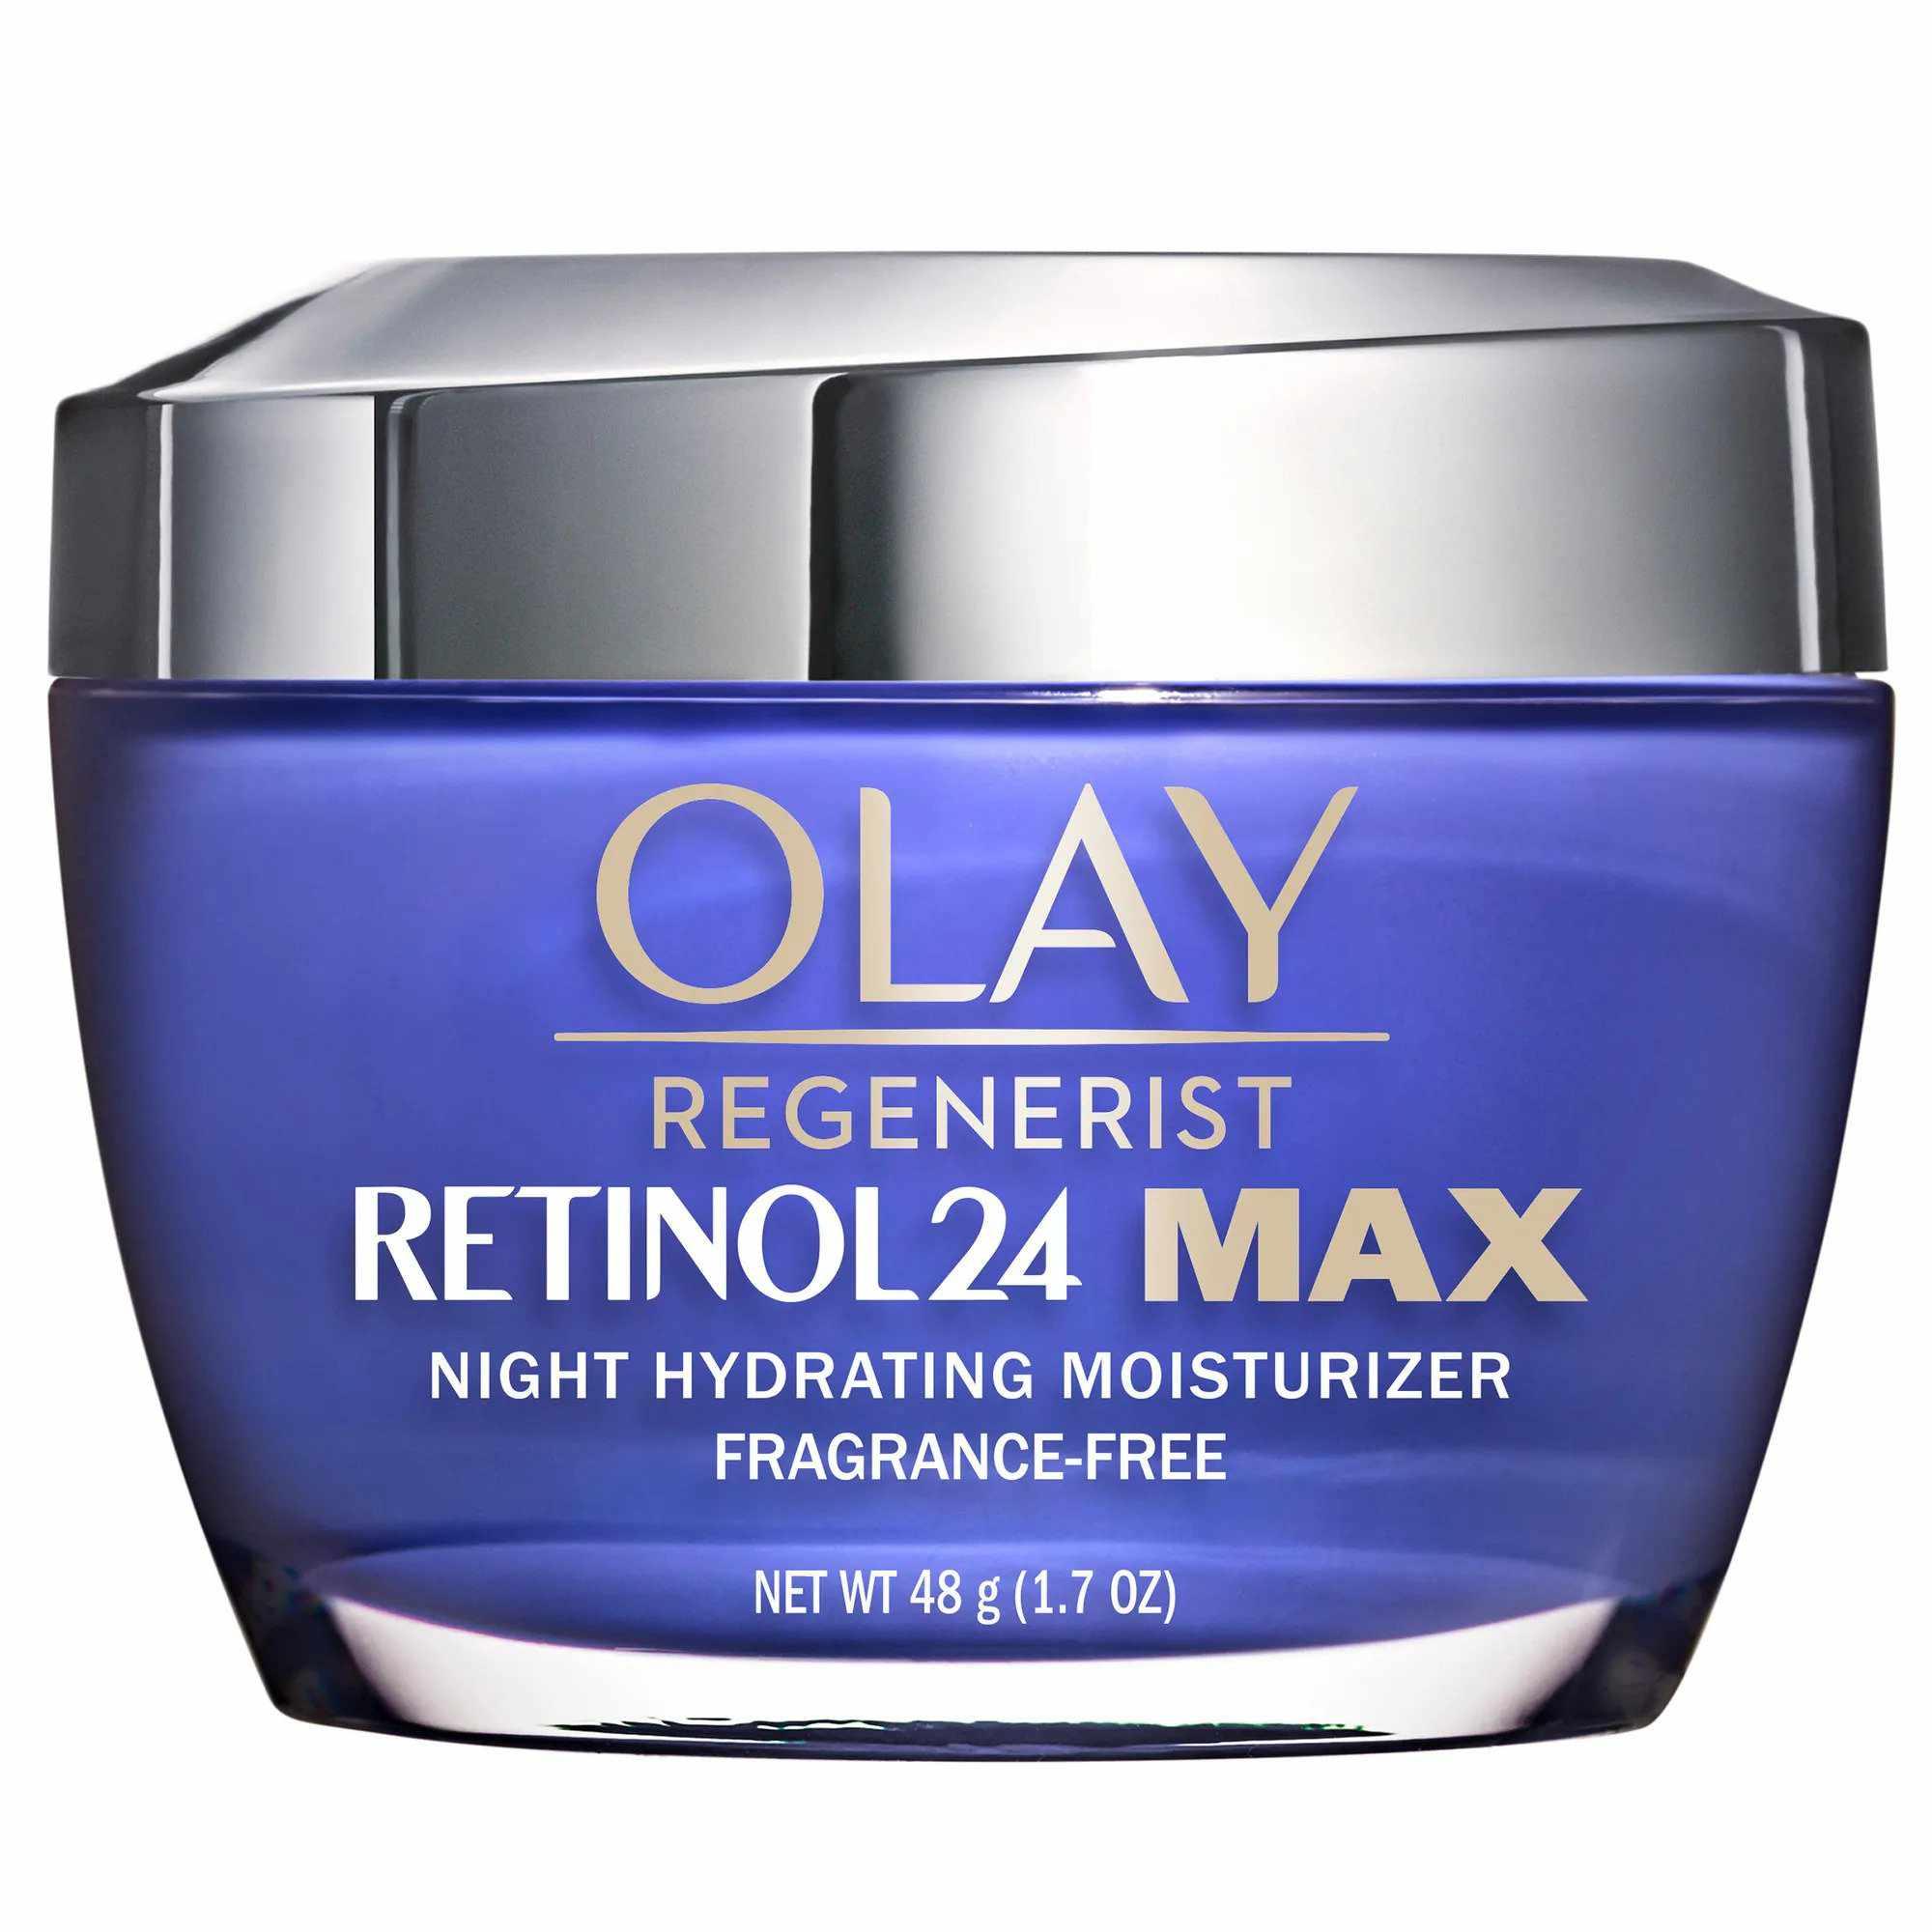 Olay Retinol24 Max